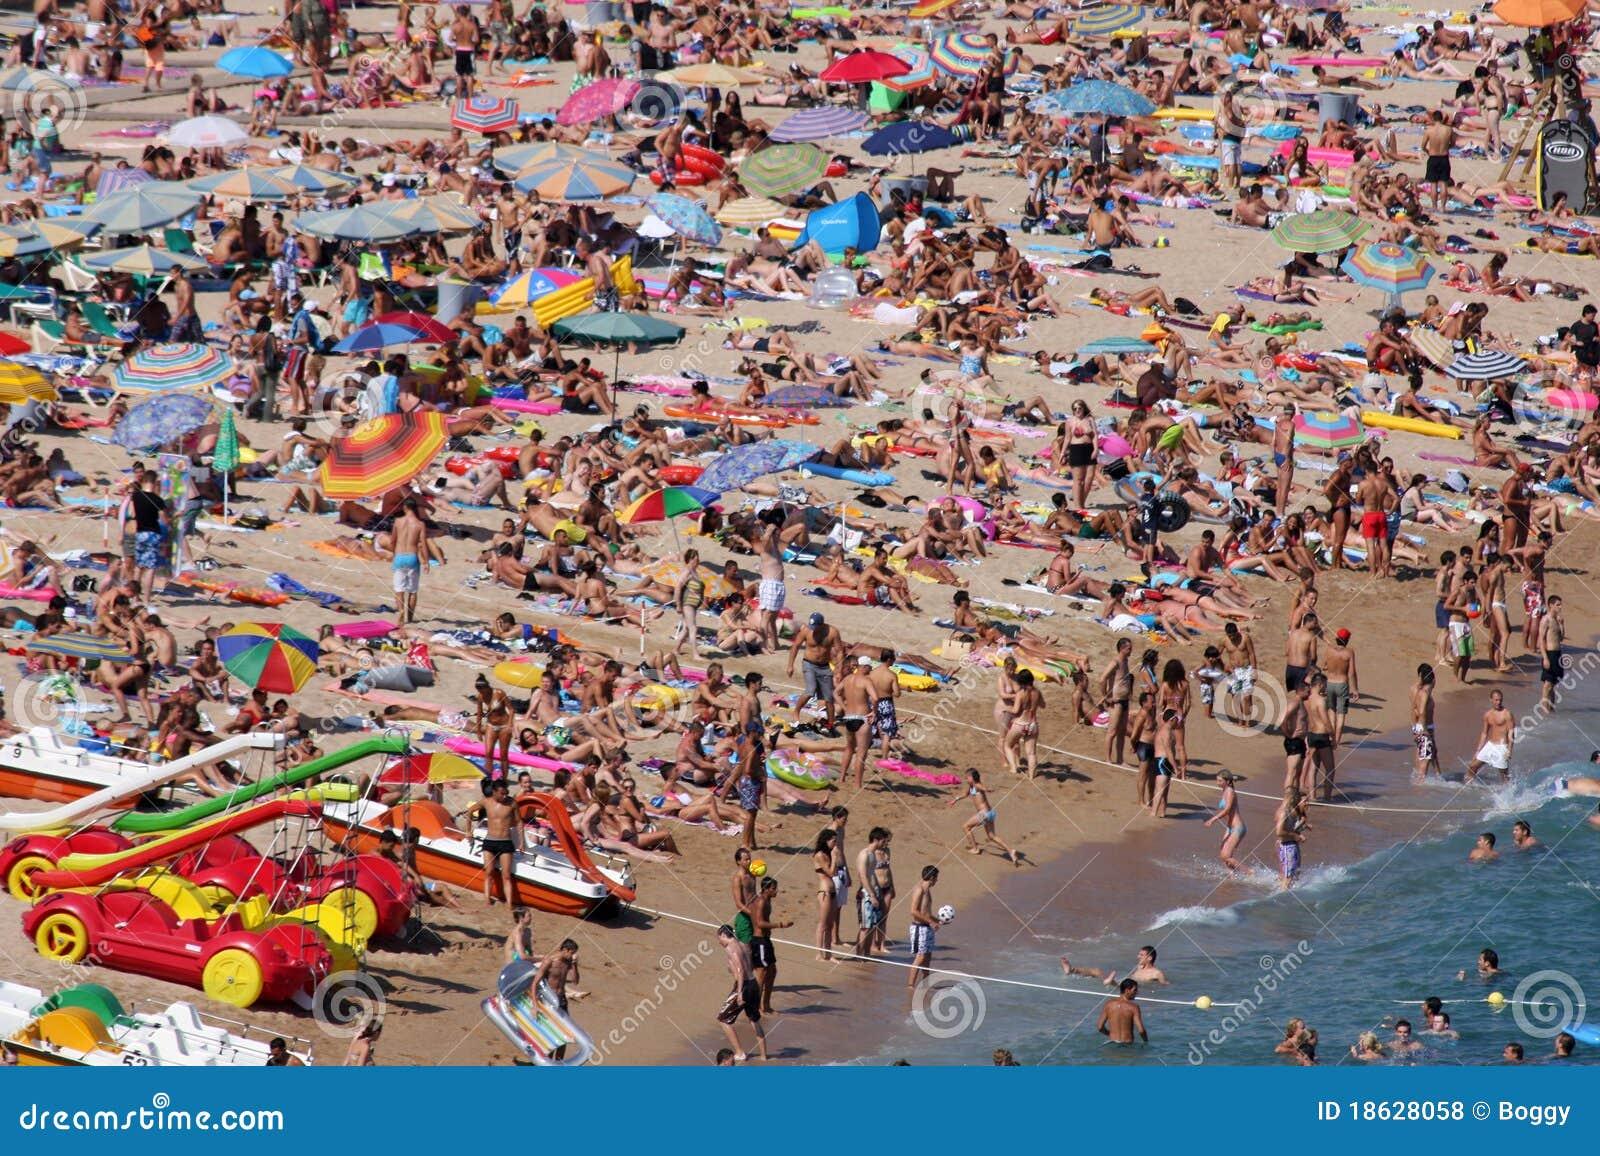 Lloret De Mar, Spain Editorial Stock Photo - Image: 18628058